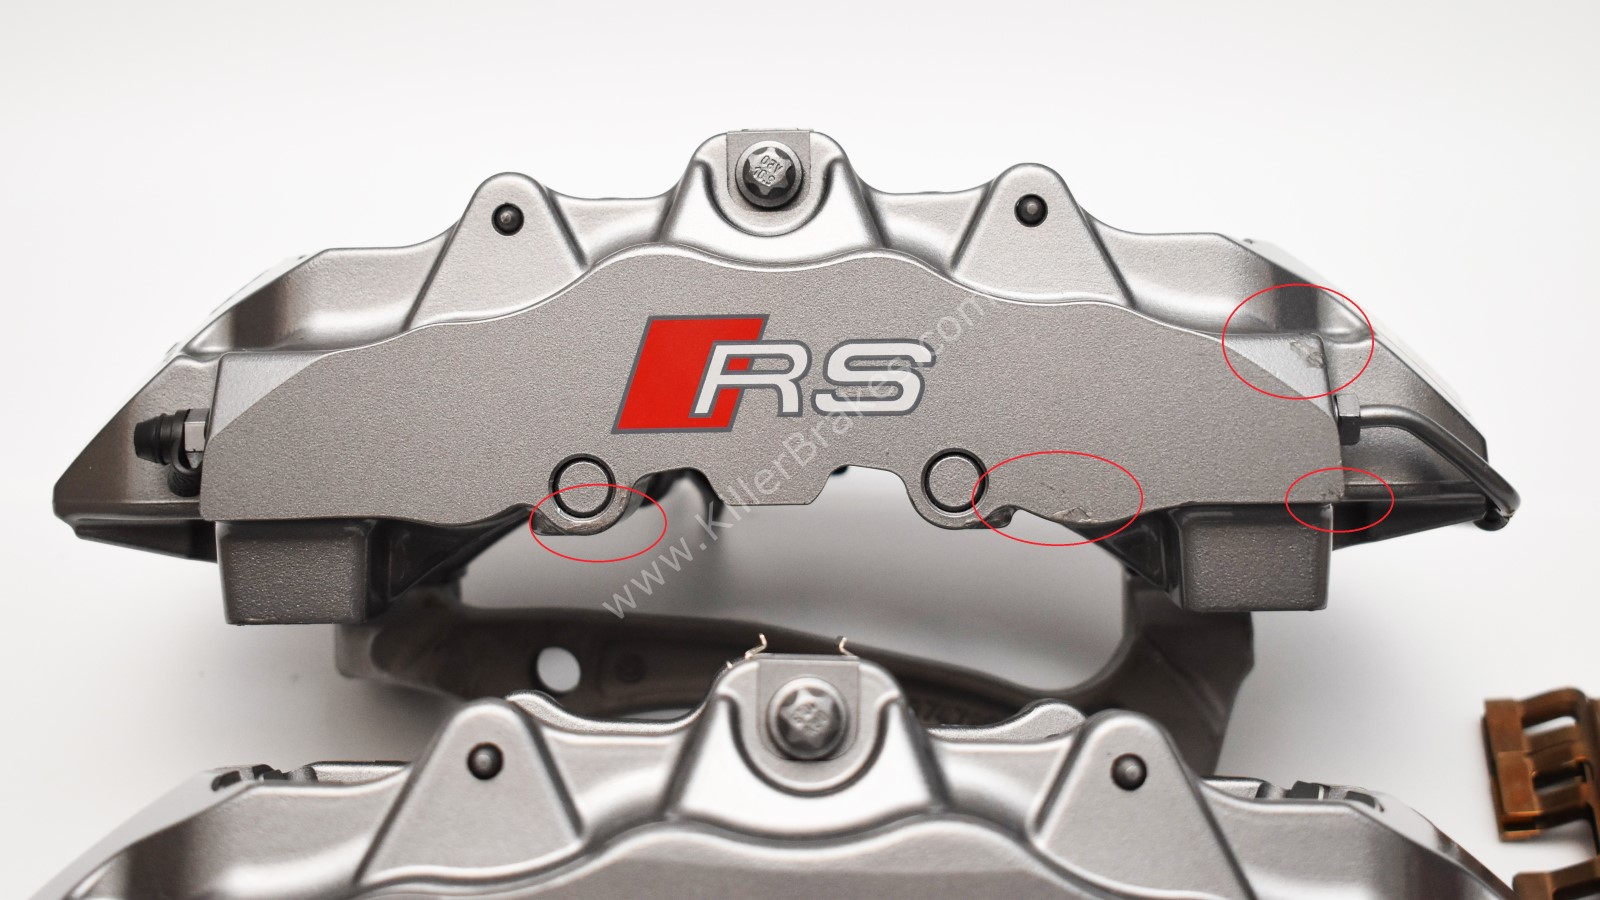 Front Audi TTRS 8S RS3 8v Ceramic Calipers 8v0615107E 8v0615108E Brembo 8pot NEW with storage signs